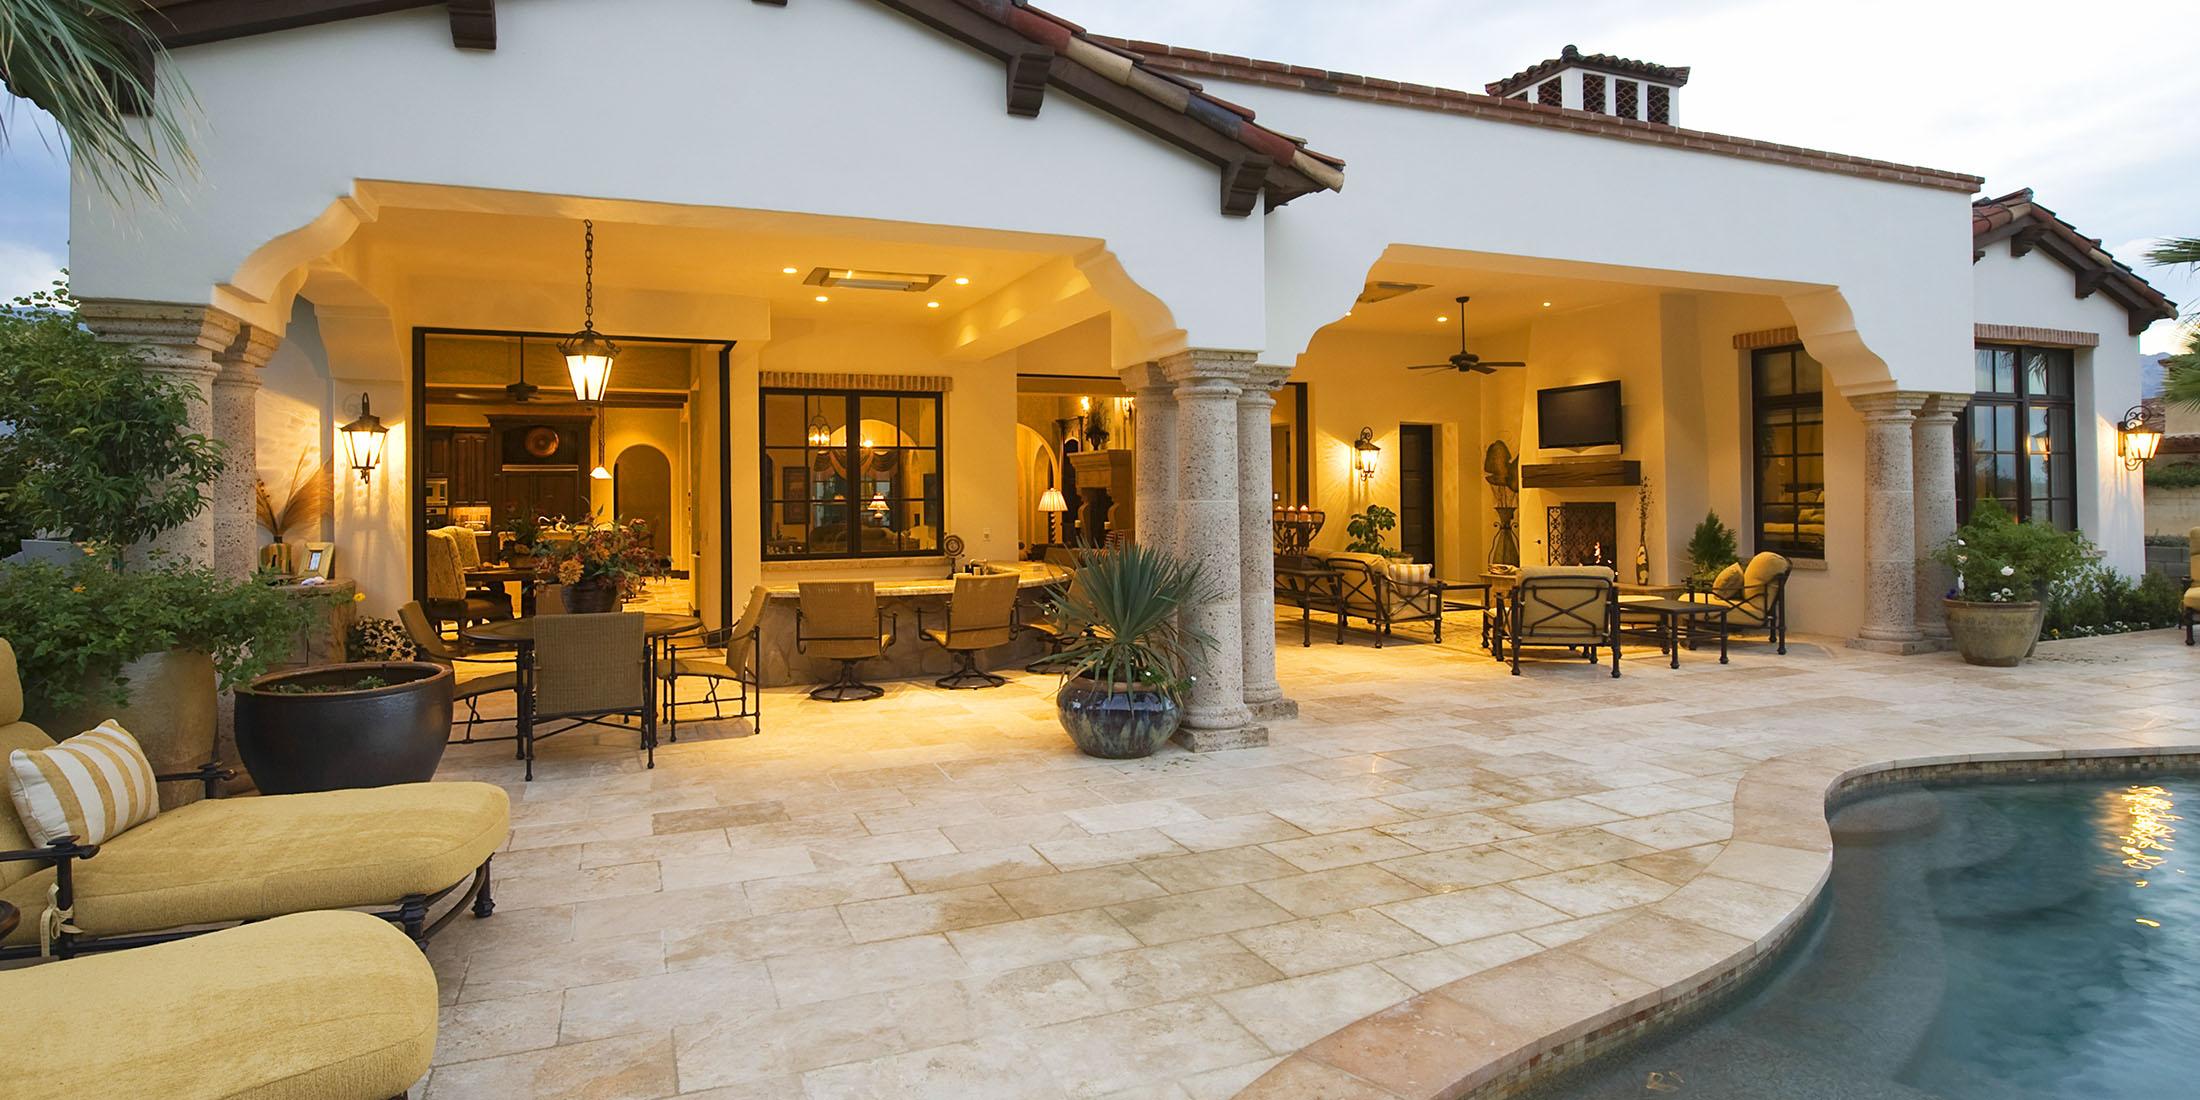 Chandler AZ real estate